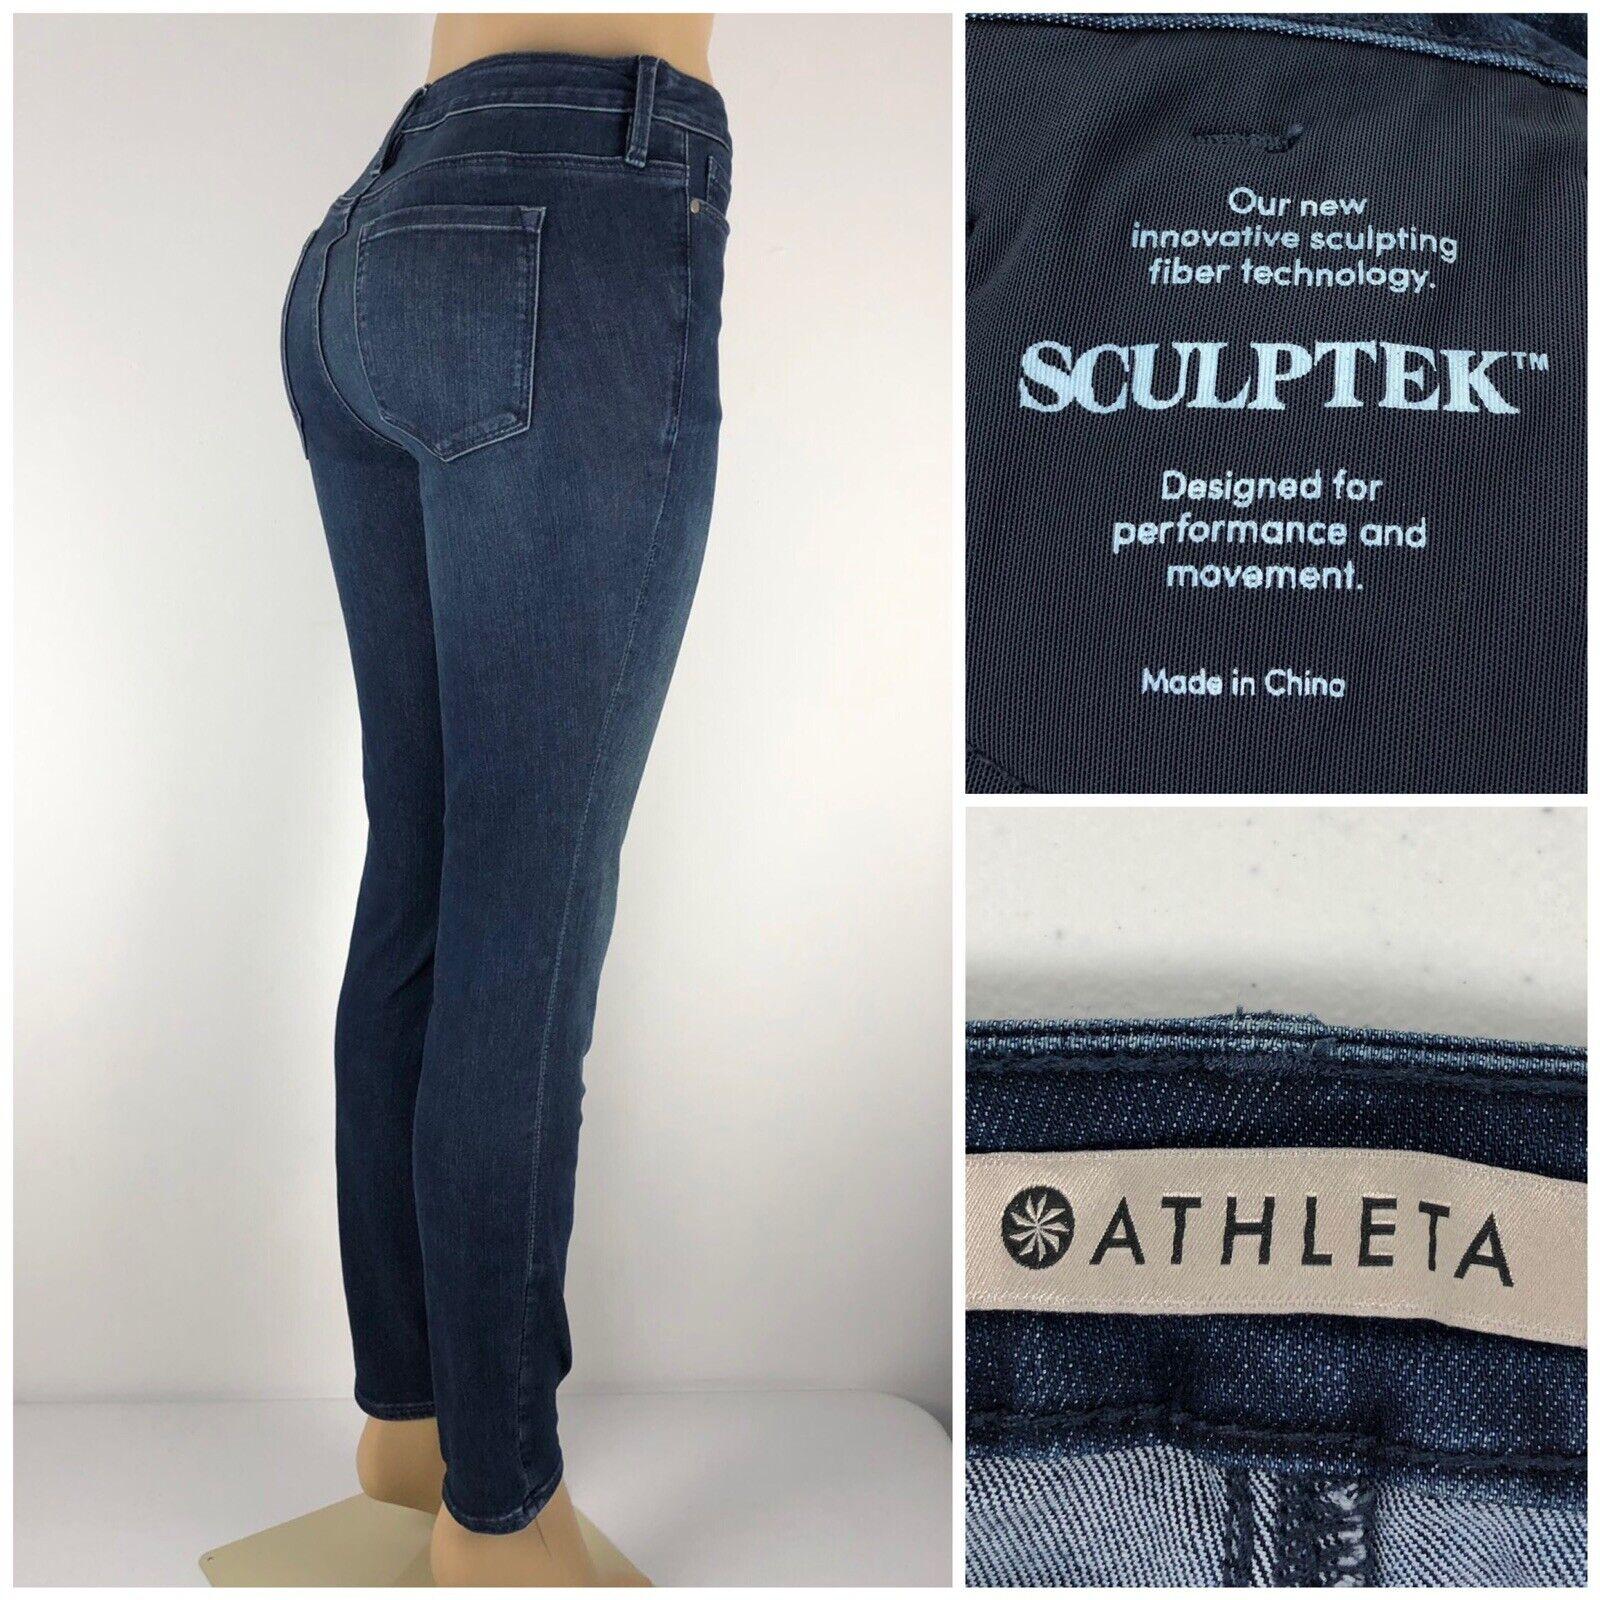 Athleta sculptek Jeans 4 en Coton Mélangé Stretch Dark Wash Skinny Slim